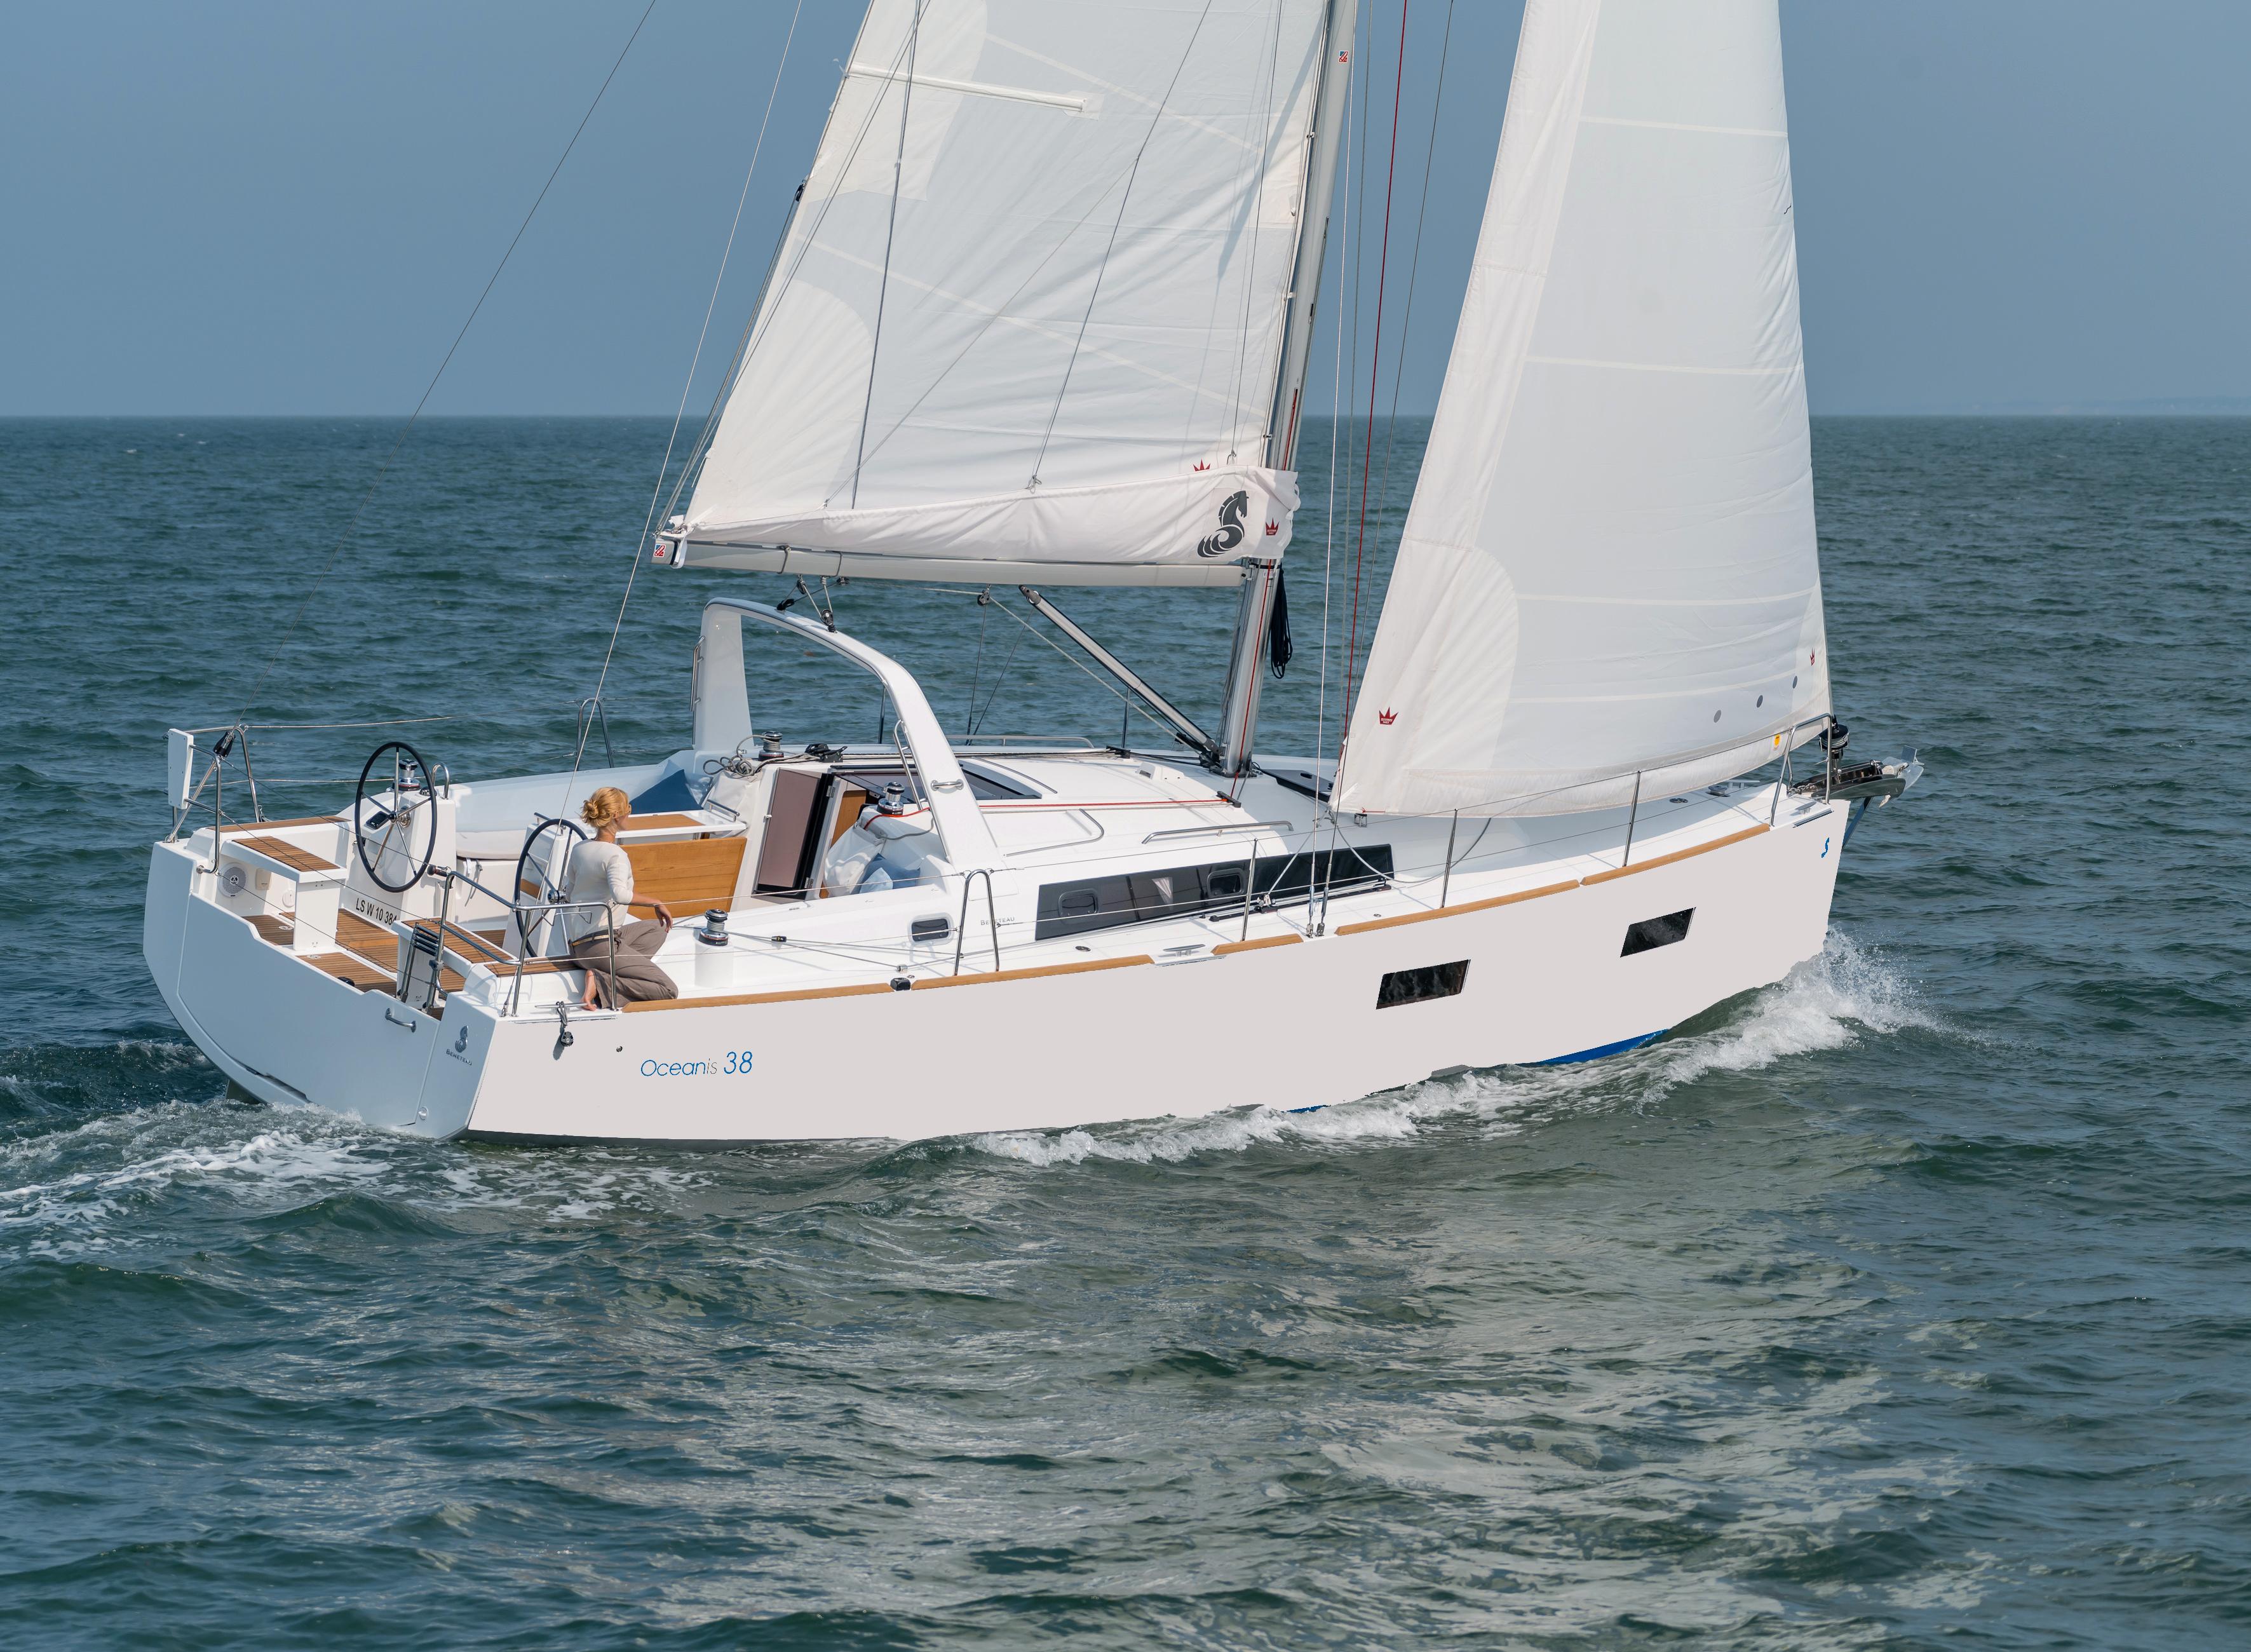 Beneteau Oceanis 38 Cruiser Beneteau Oceanis 38 Cruiser